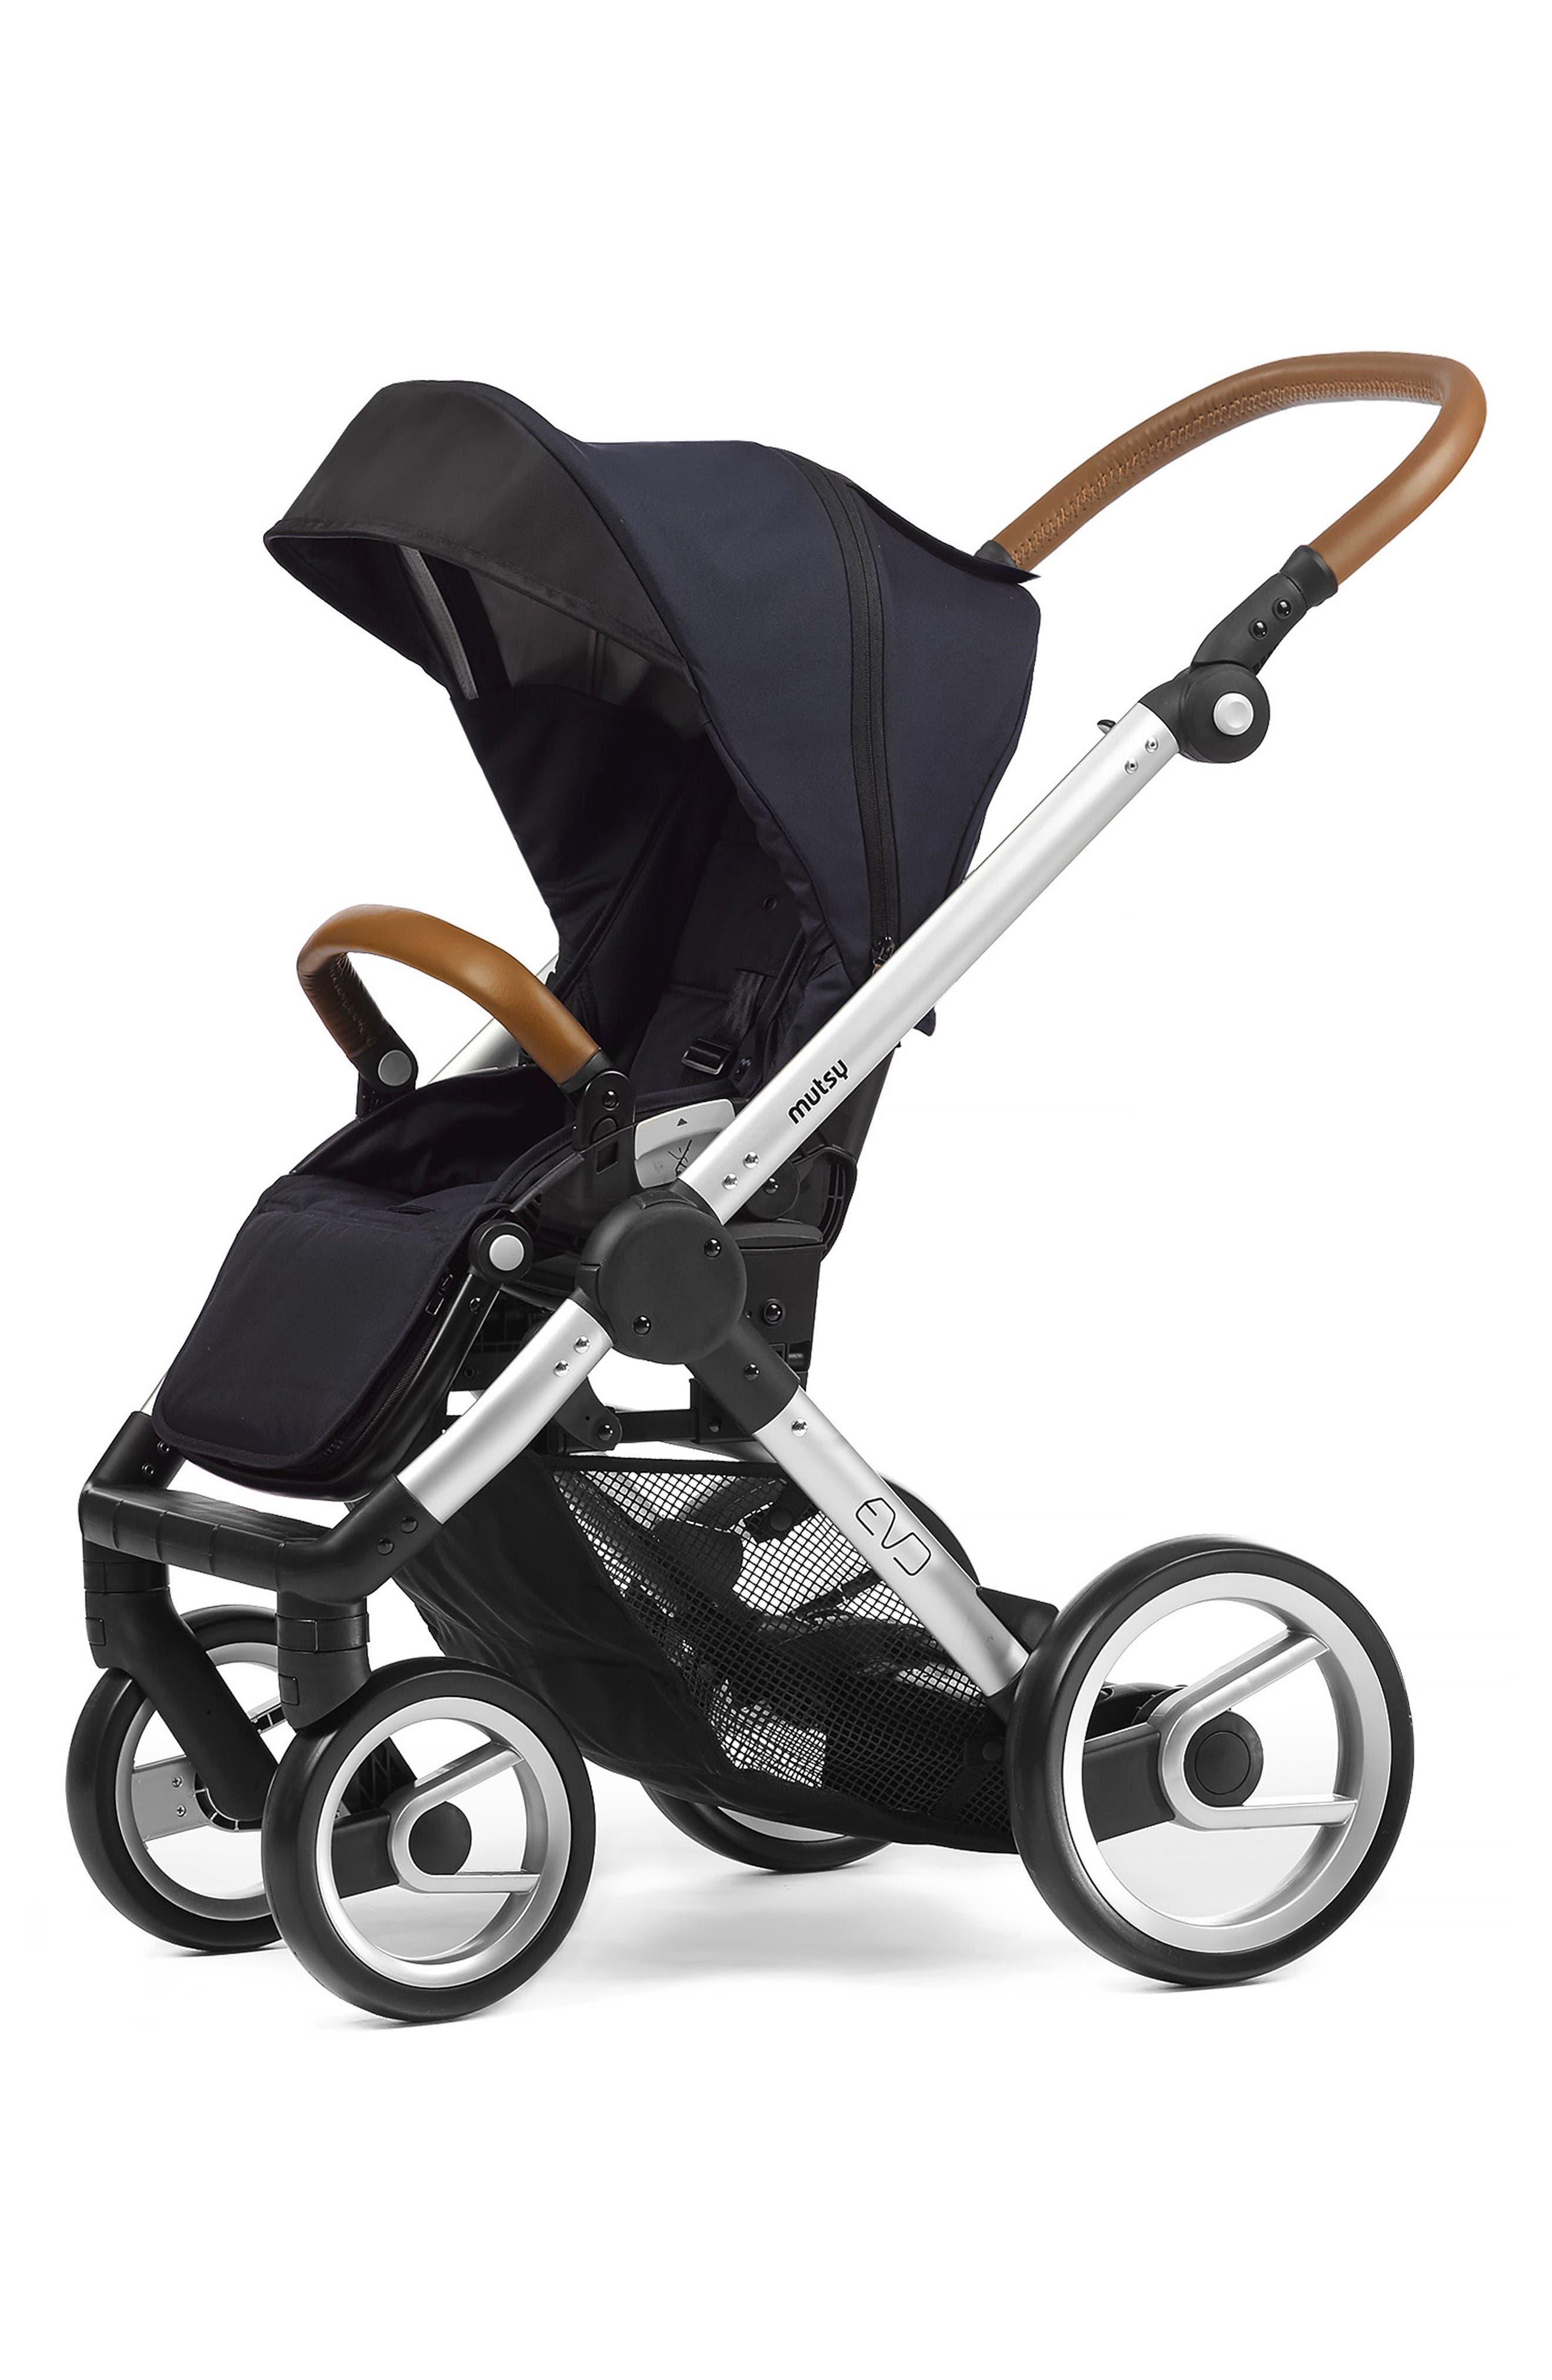 Main Image - Mutsy Evo - Urban Nomad Stroller